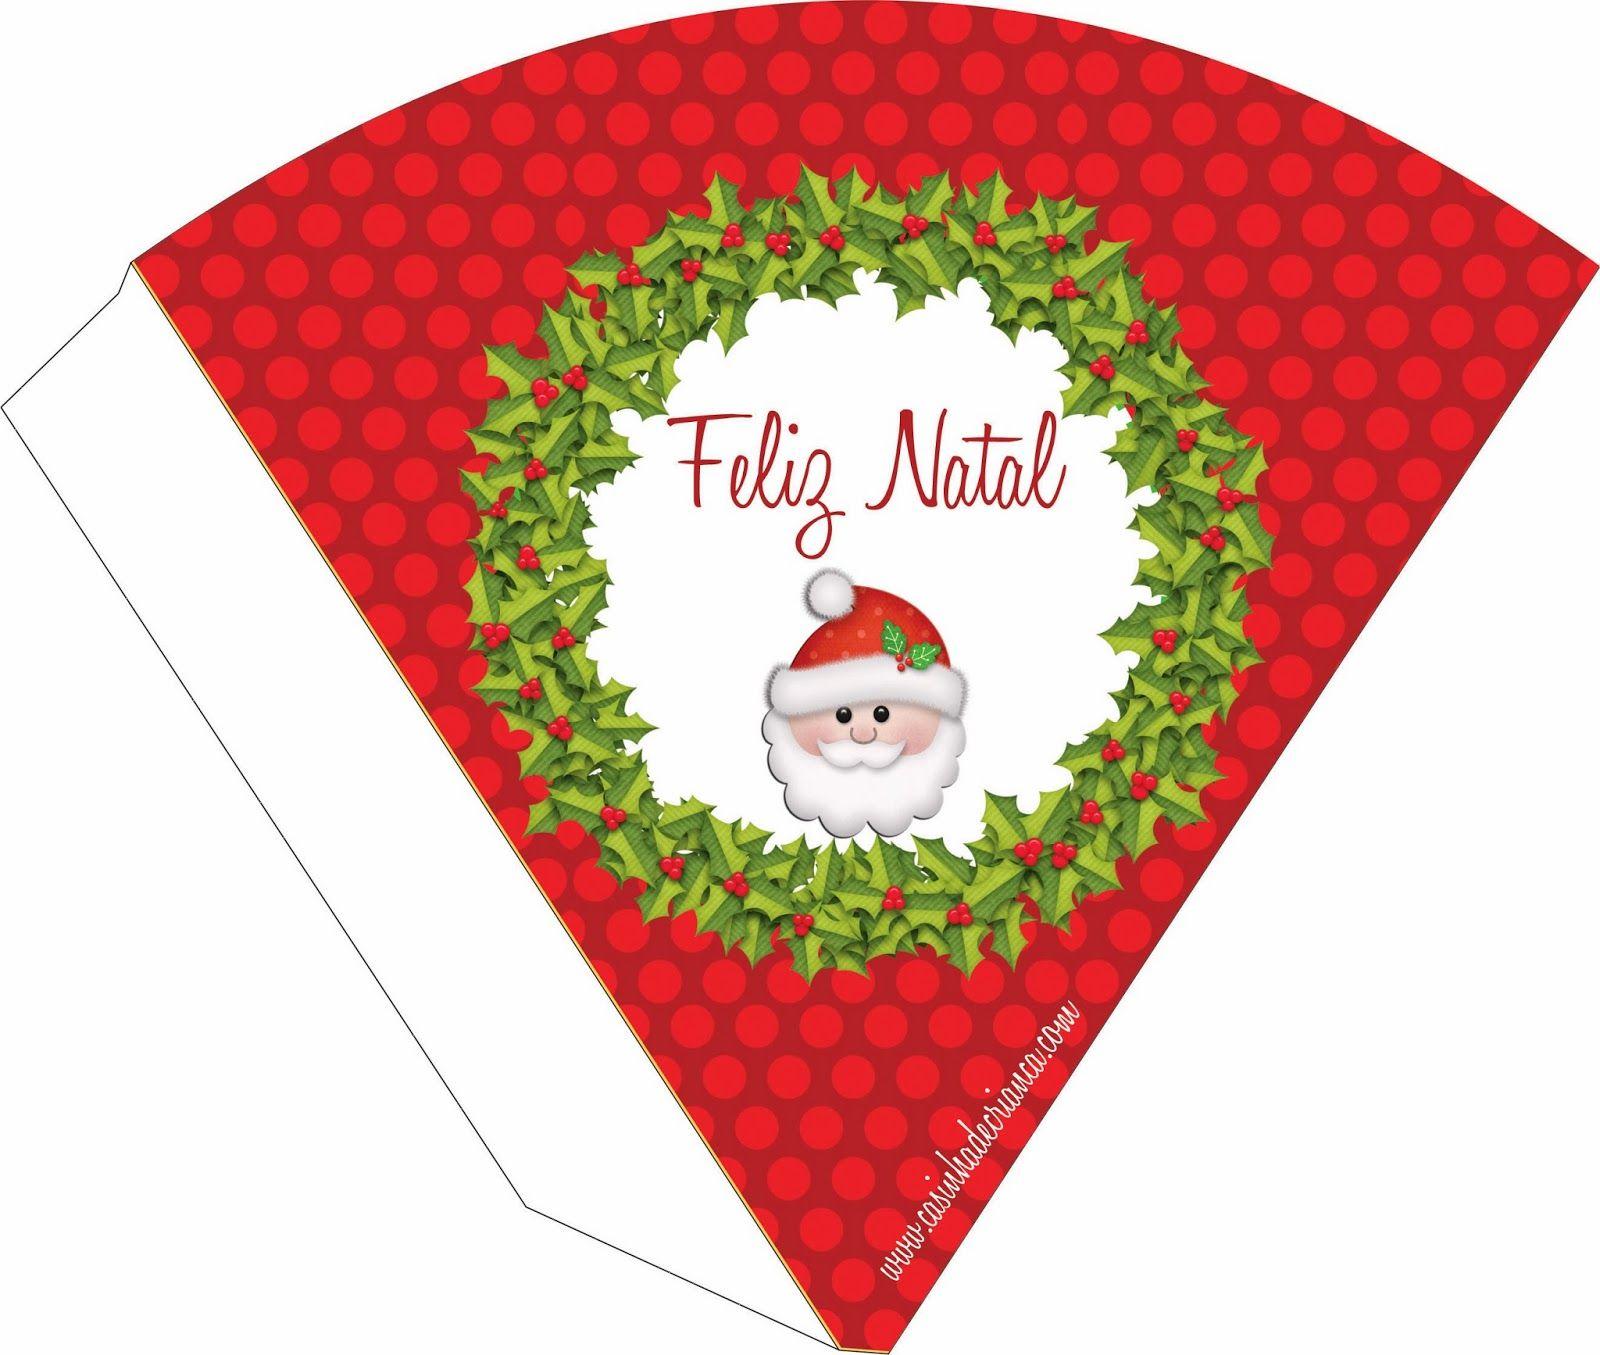 Kit Festa Natal Para Imprimir Grátis Festa De Natal Natal